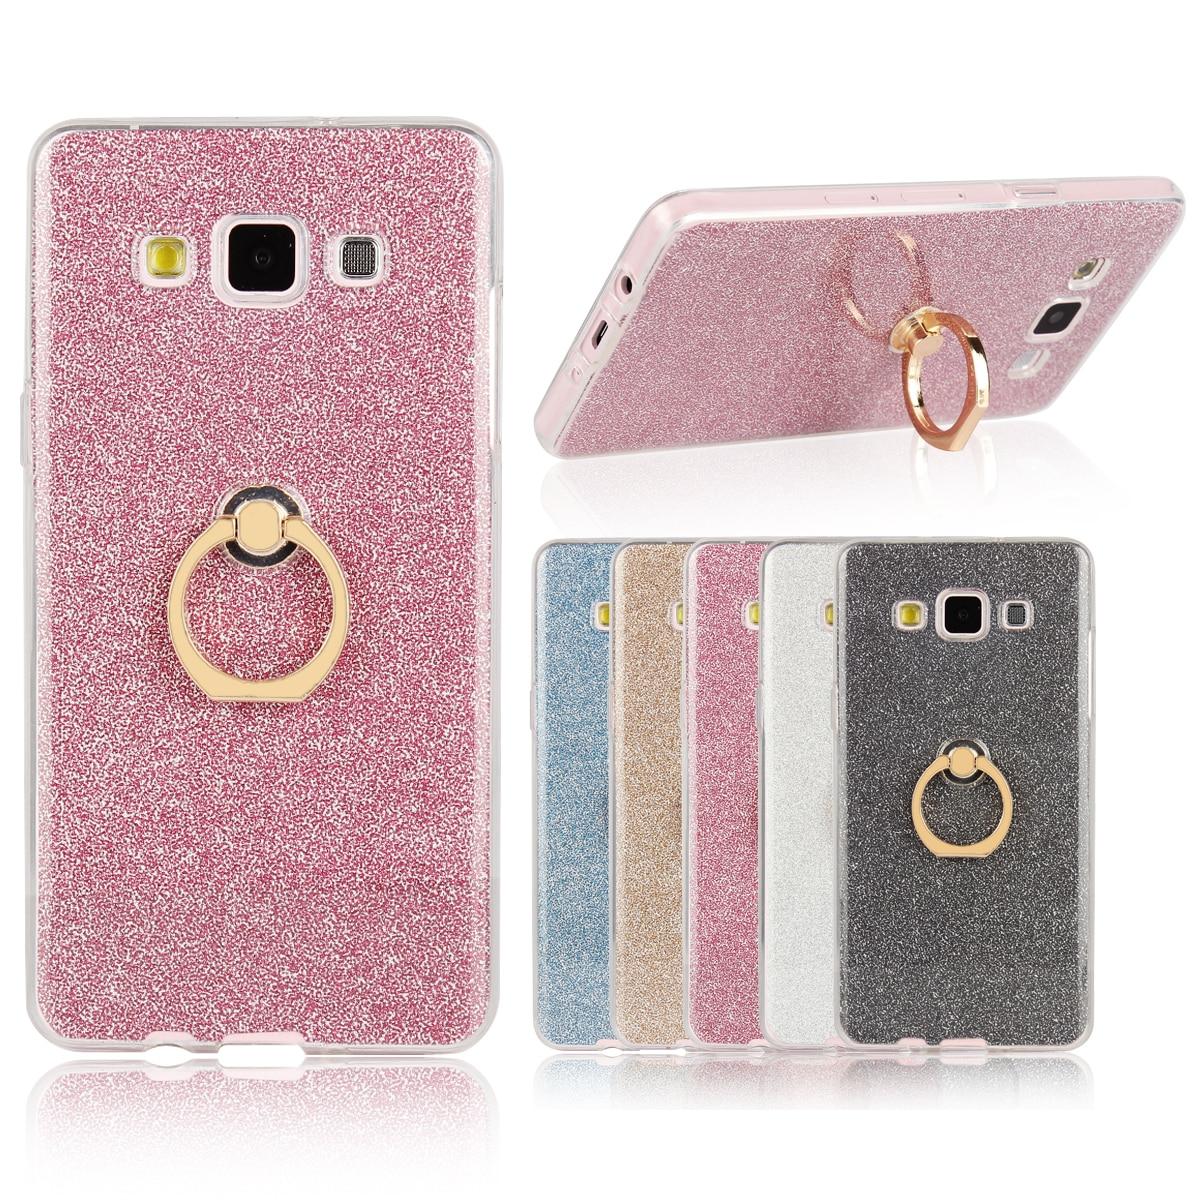 Case for Samsung Galaxy A5 a 5 Flash powder TPU Case for Samsung A 5 2015 A500F A500FU A500M/Y/YZ/FQ/F1/K/S Finger buckle Phone